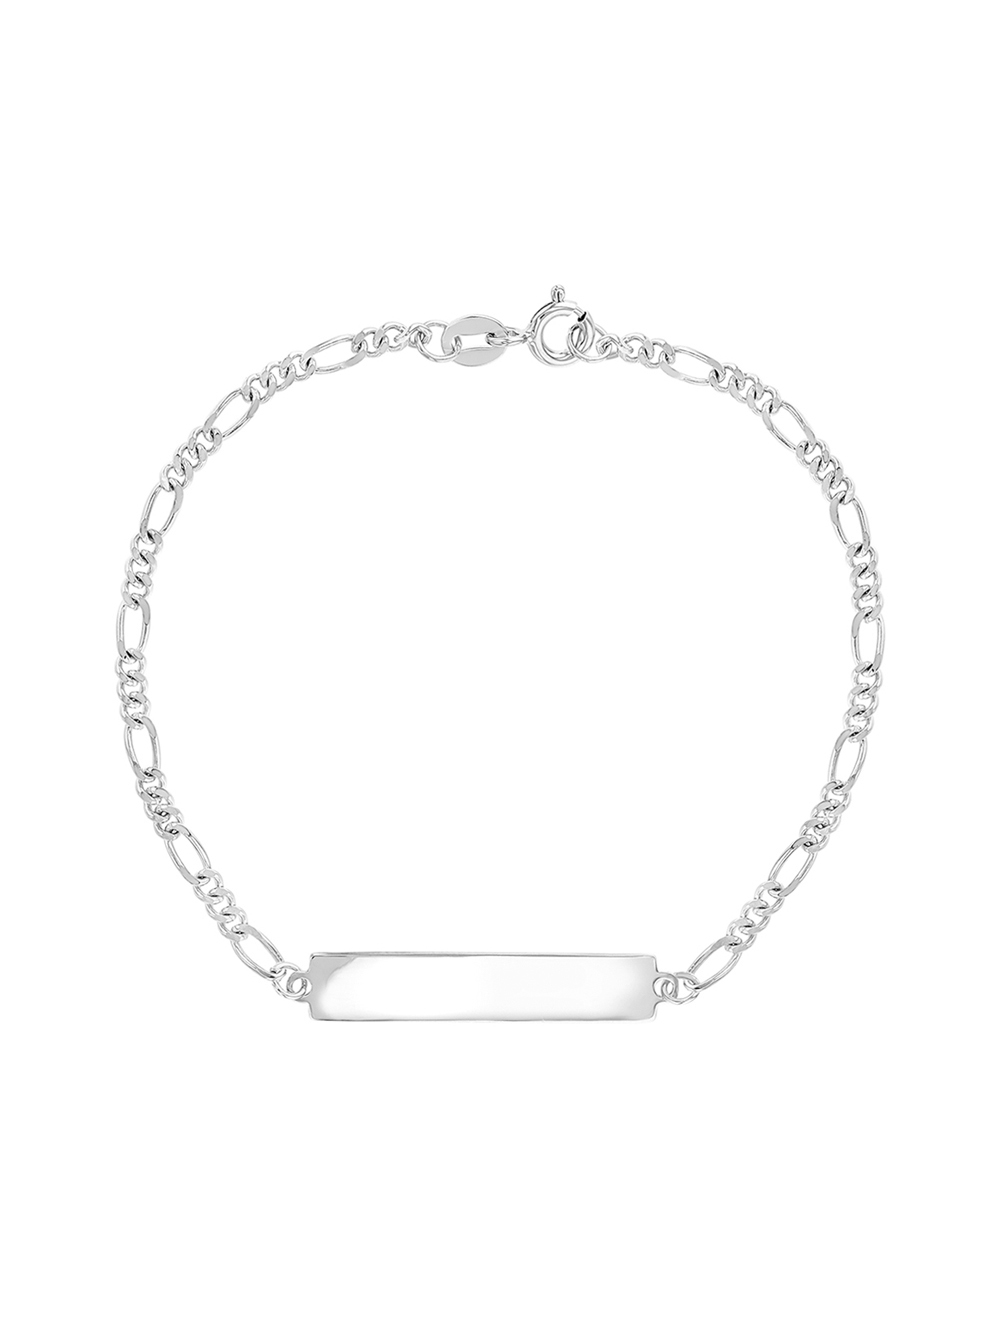 925 Sterling Silver Childrens ID Figaro Bracelet Childs Identity